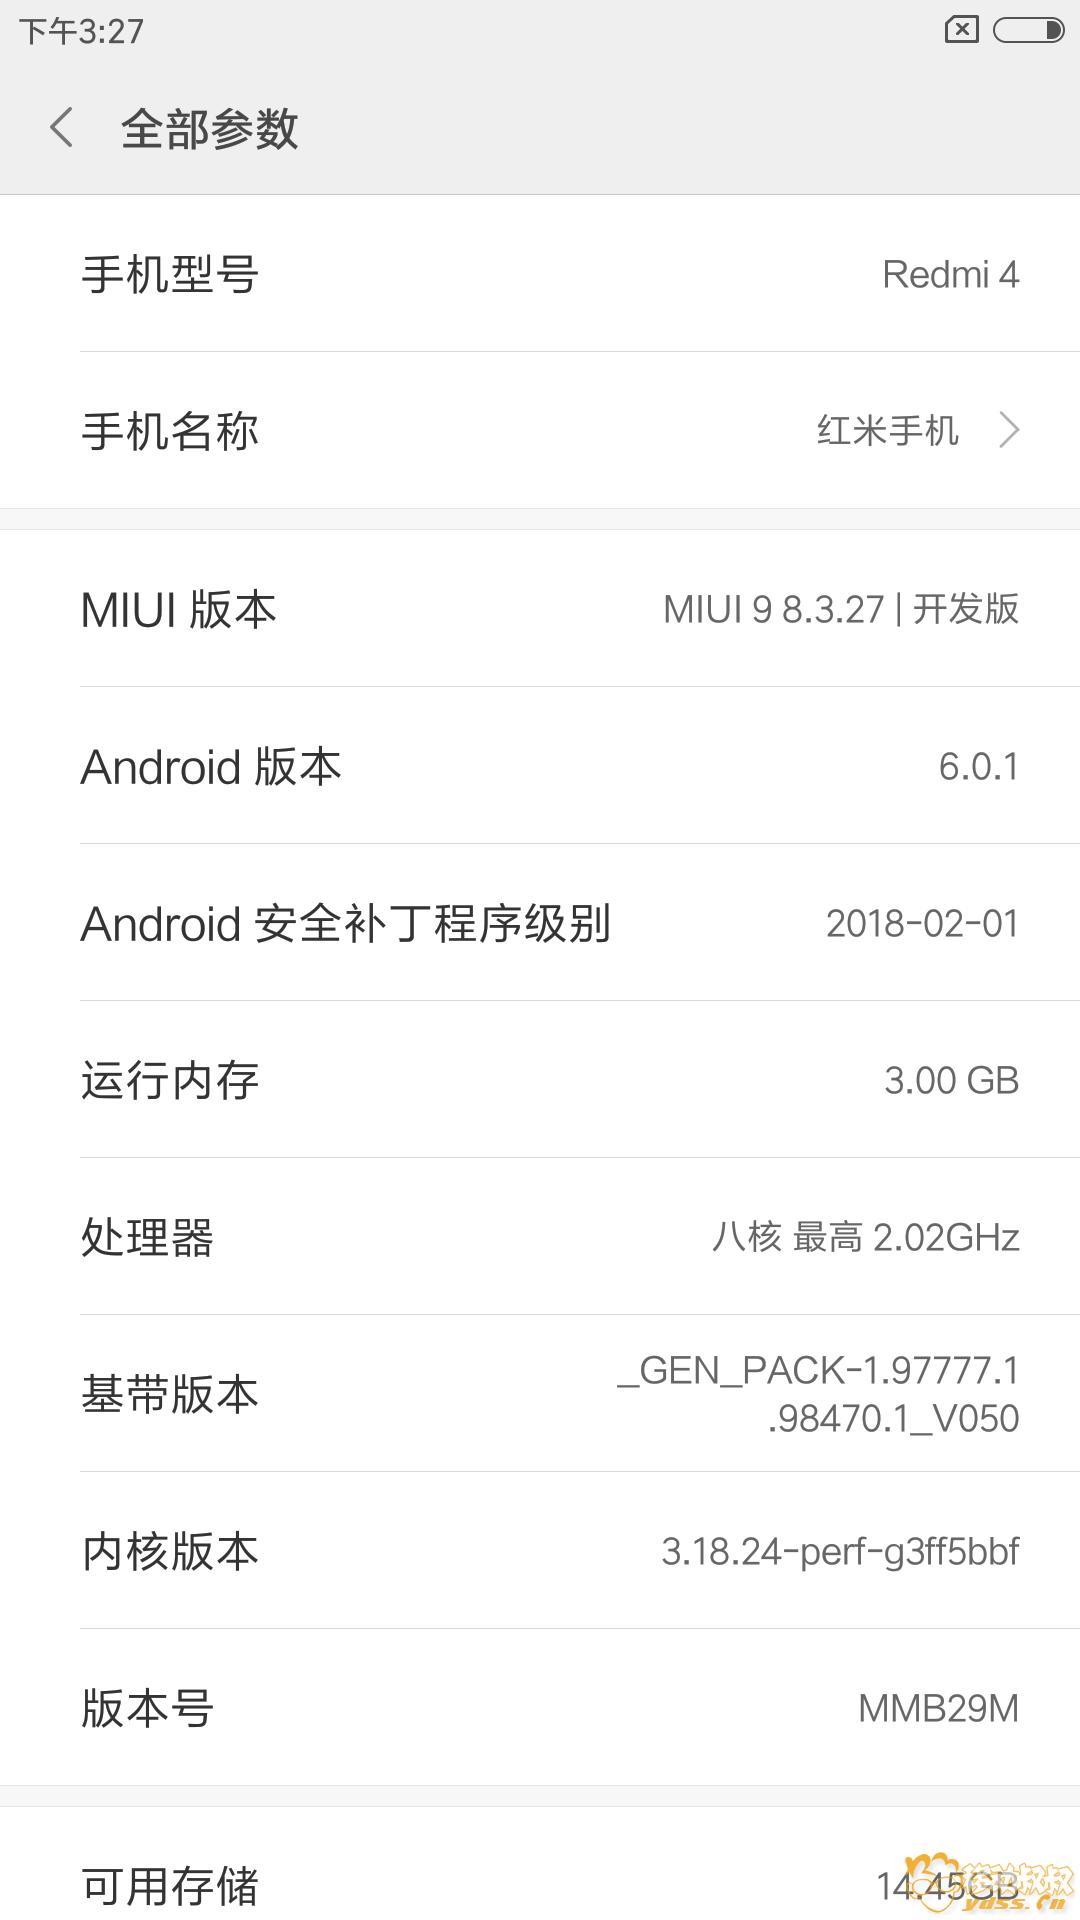 Screenshot_2018-03-27-15-27-31-301_com.android.settings.png